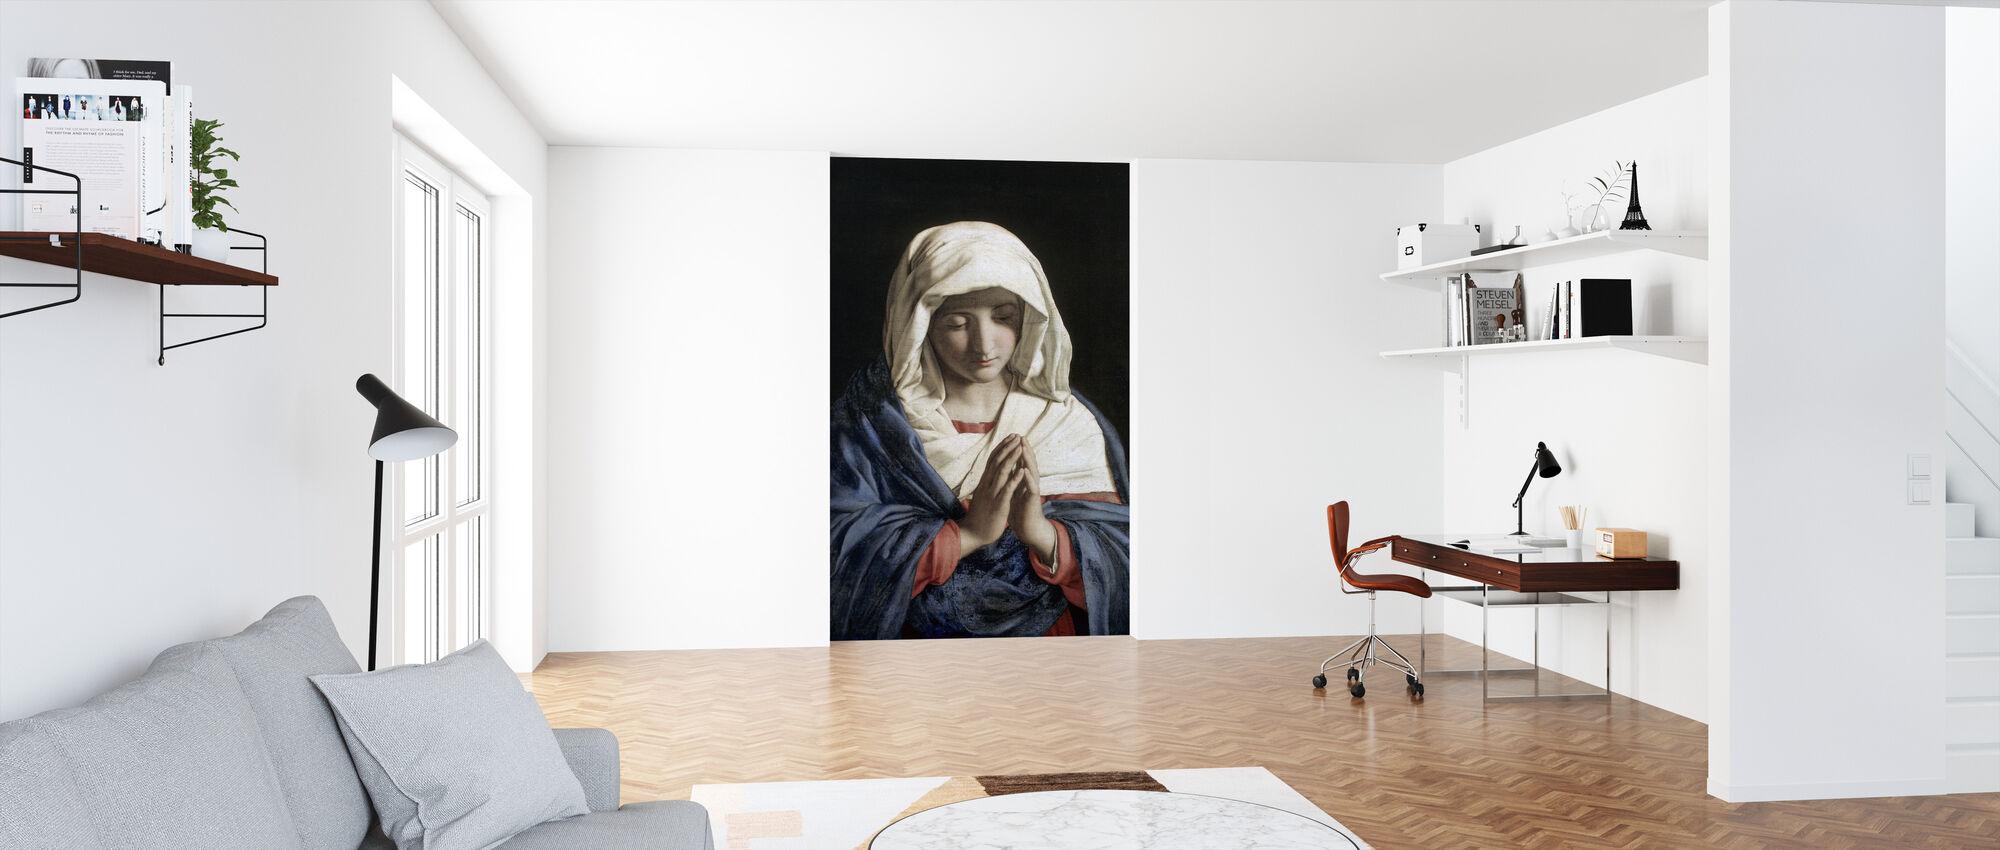 Madonna in Prayer - Giovanni Battista - Wallpaper - Office